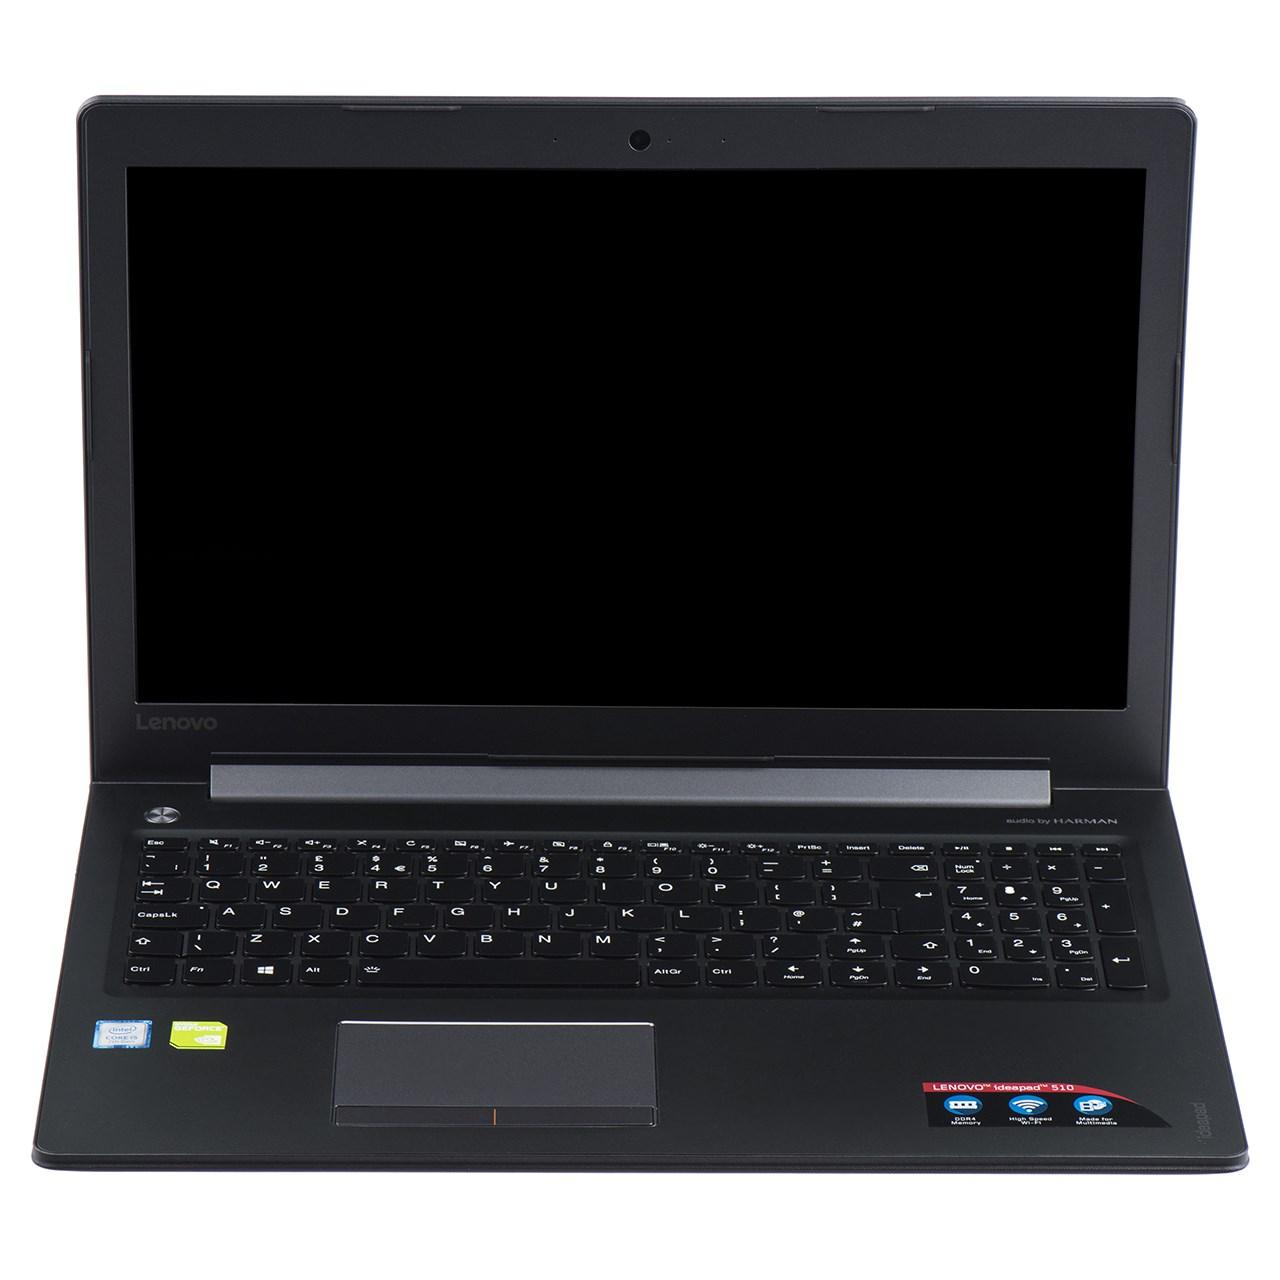 لپ تاپ 15 اینچی لنوو مدل Ideapad 510 - H